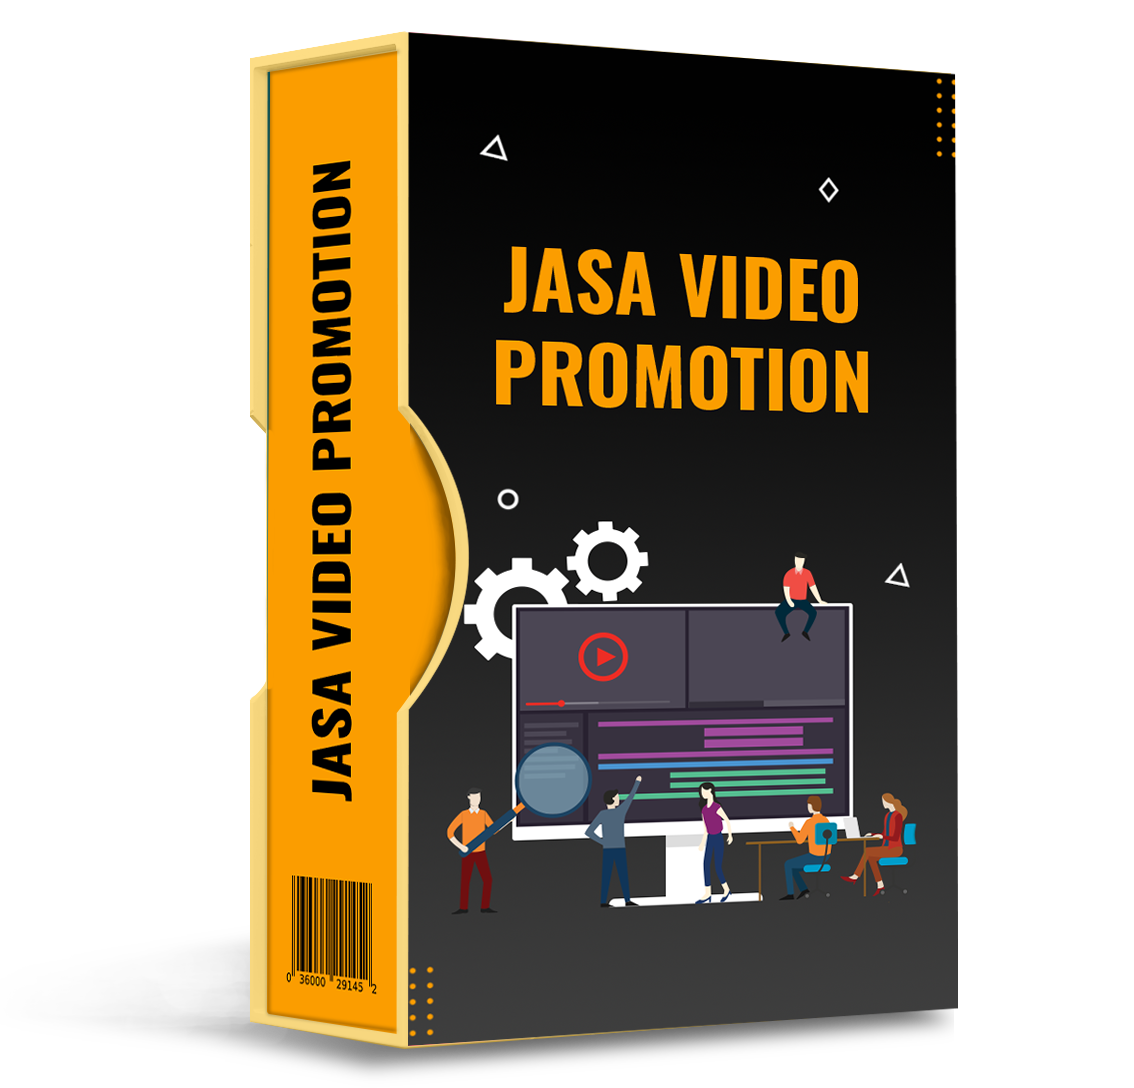 jasa video promotion